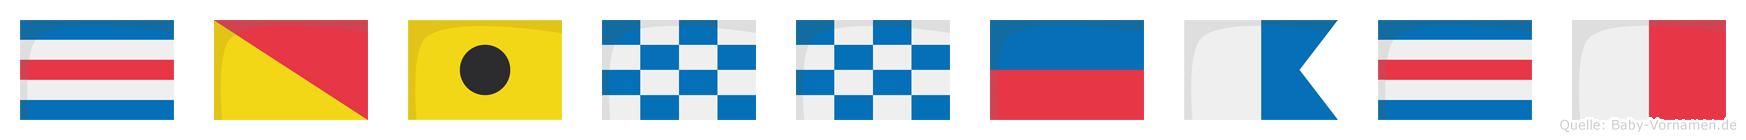 Coinneach im Flaggenalphabet